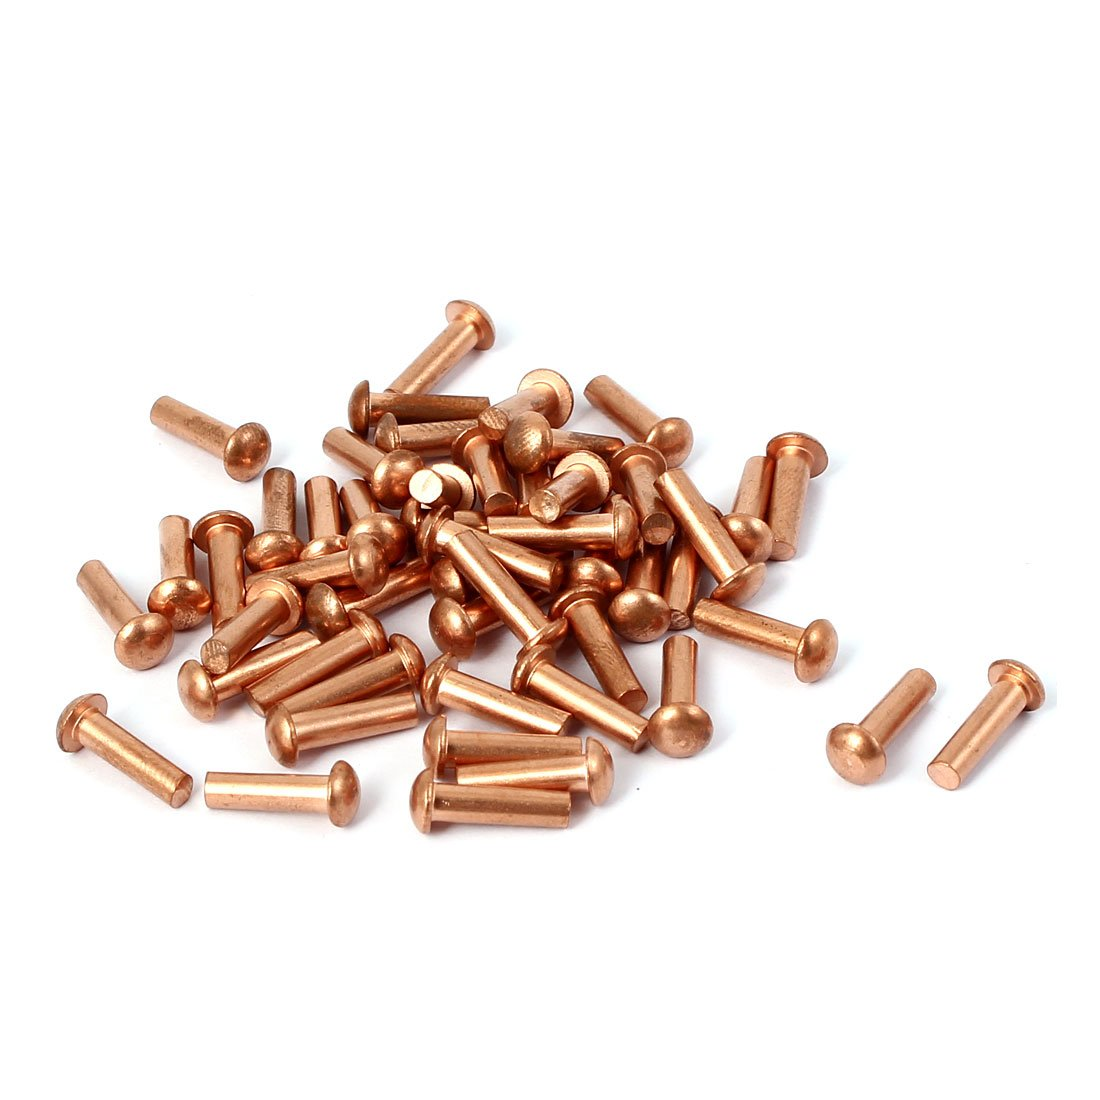 uxcell3mm x 10mm Shaft Flat Head Bolts Copper Solid Rivets Fasteners Gold Tone 50 Pcs